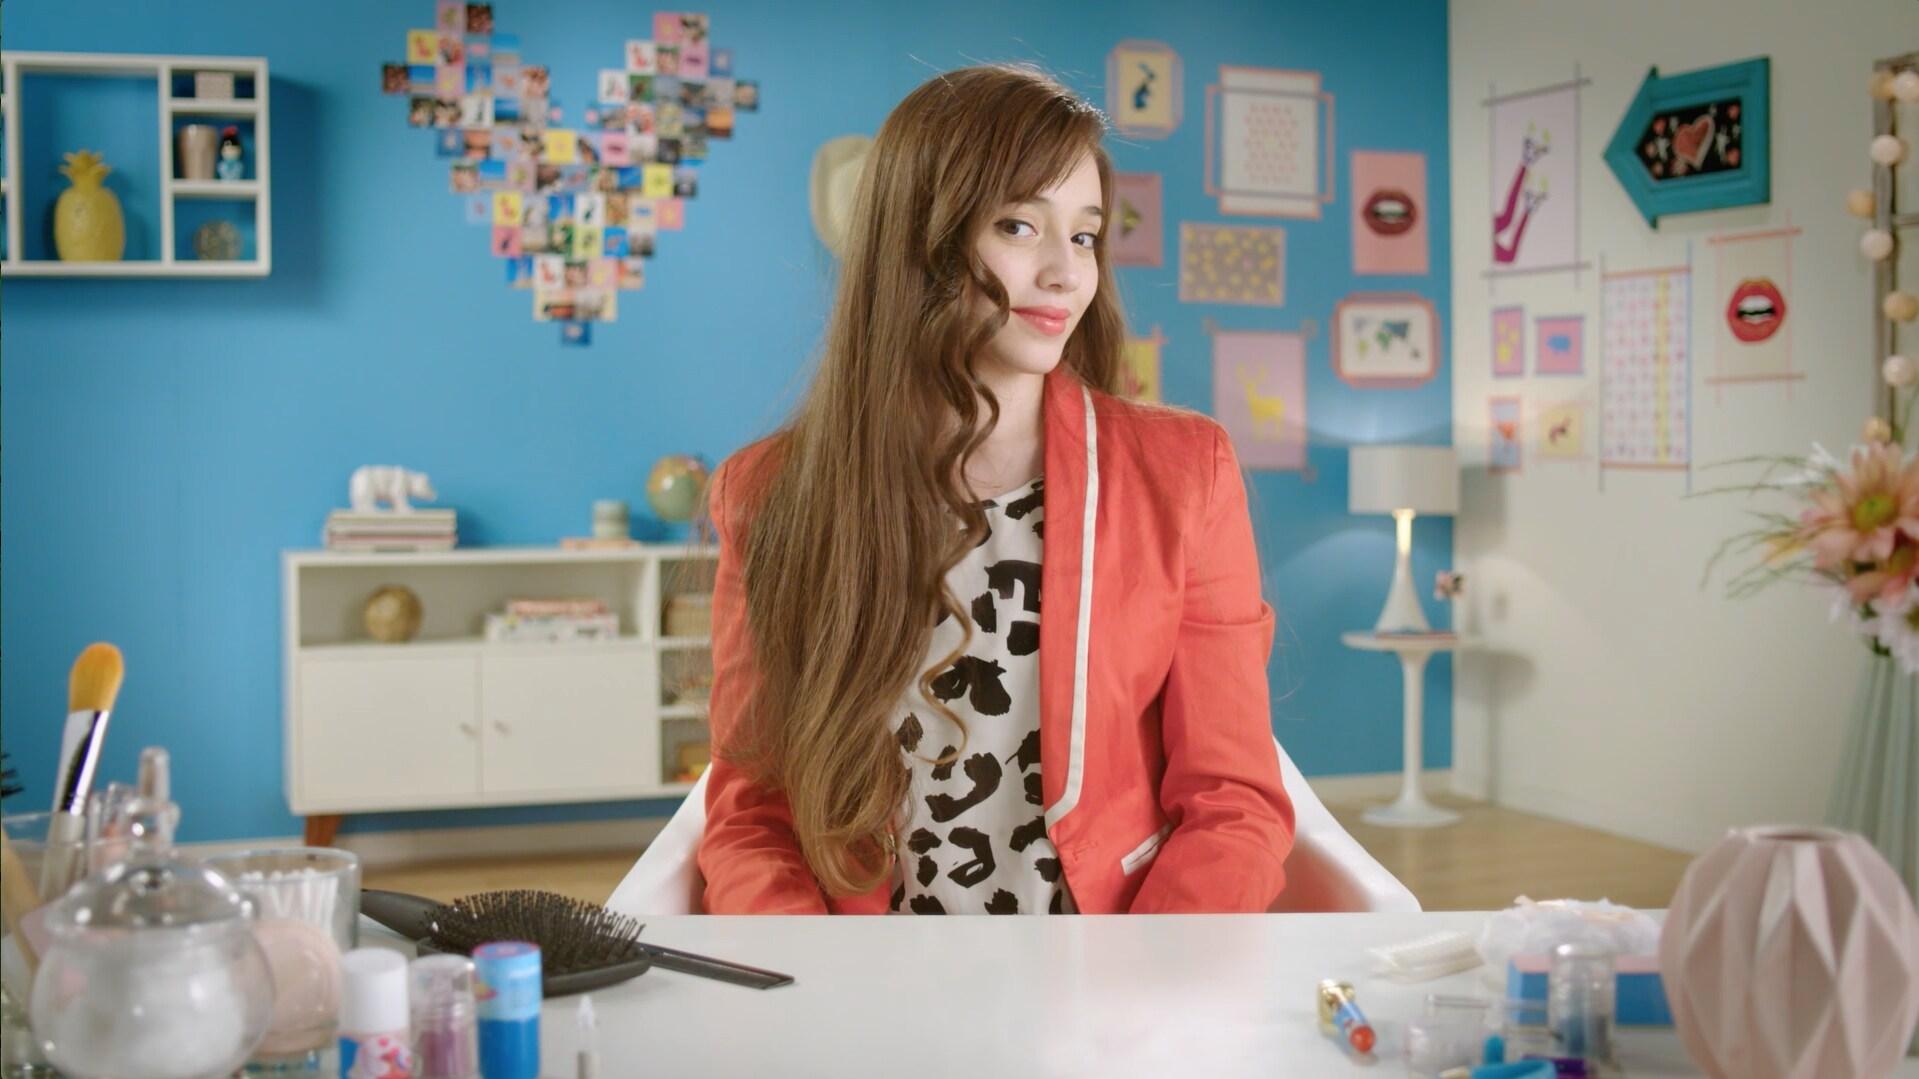 Hairstyle inspirado no Delfi - Sou Luna